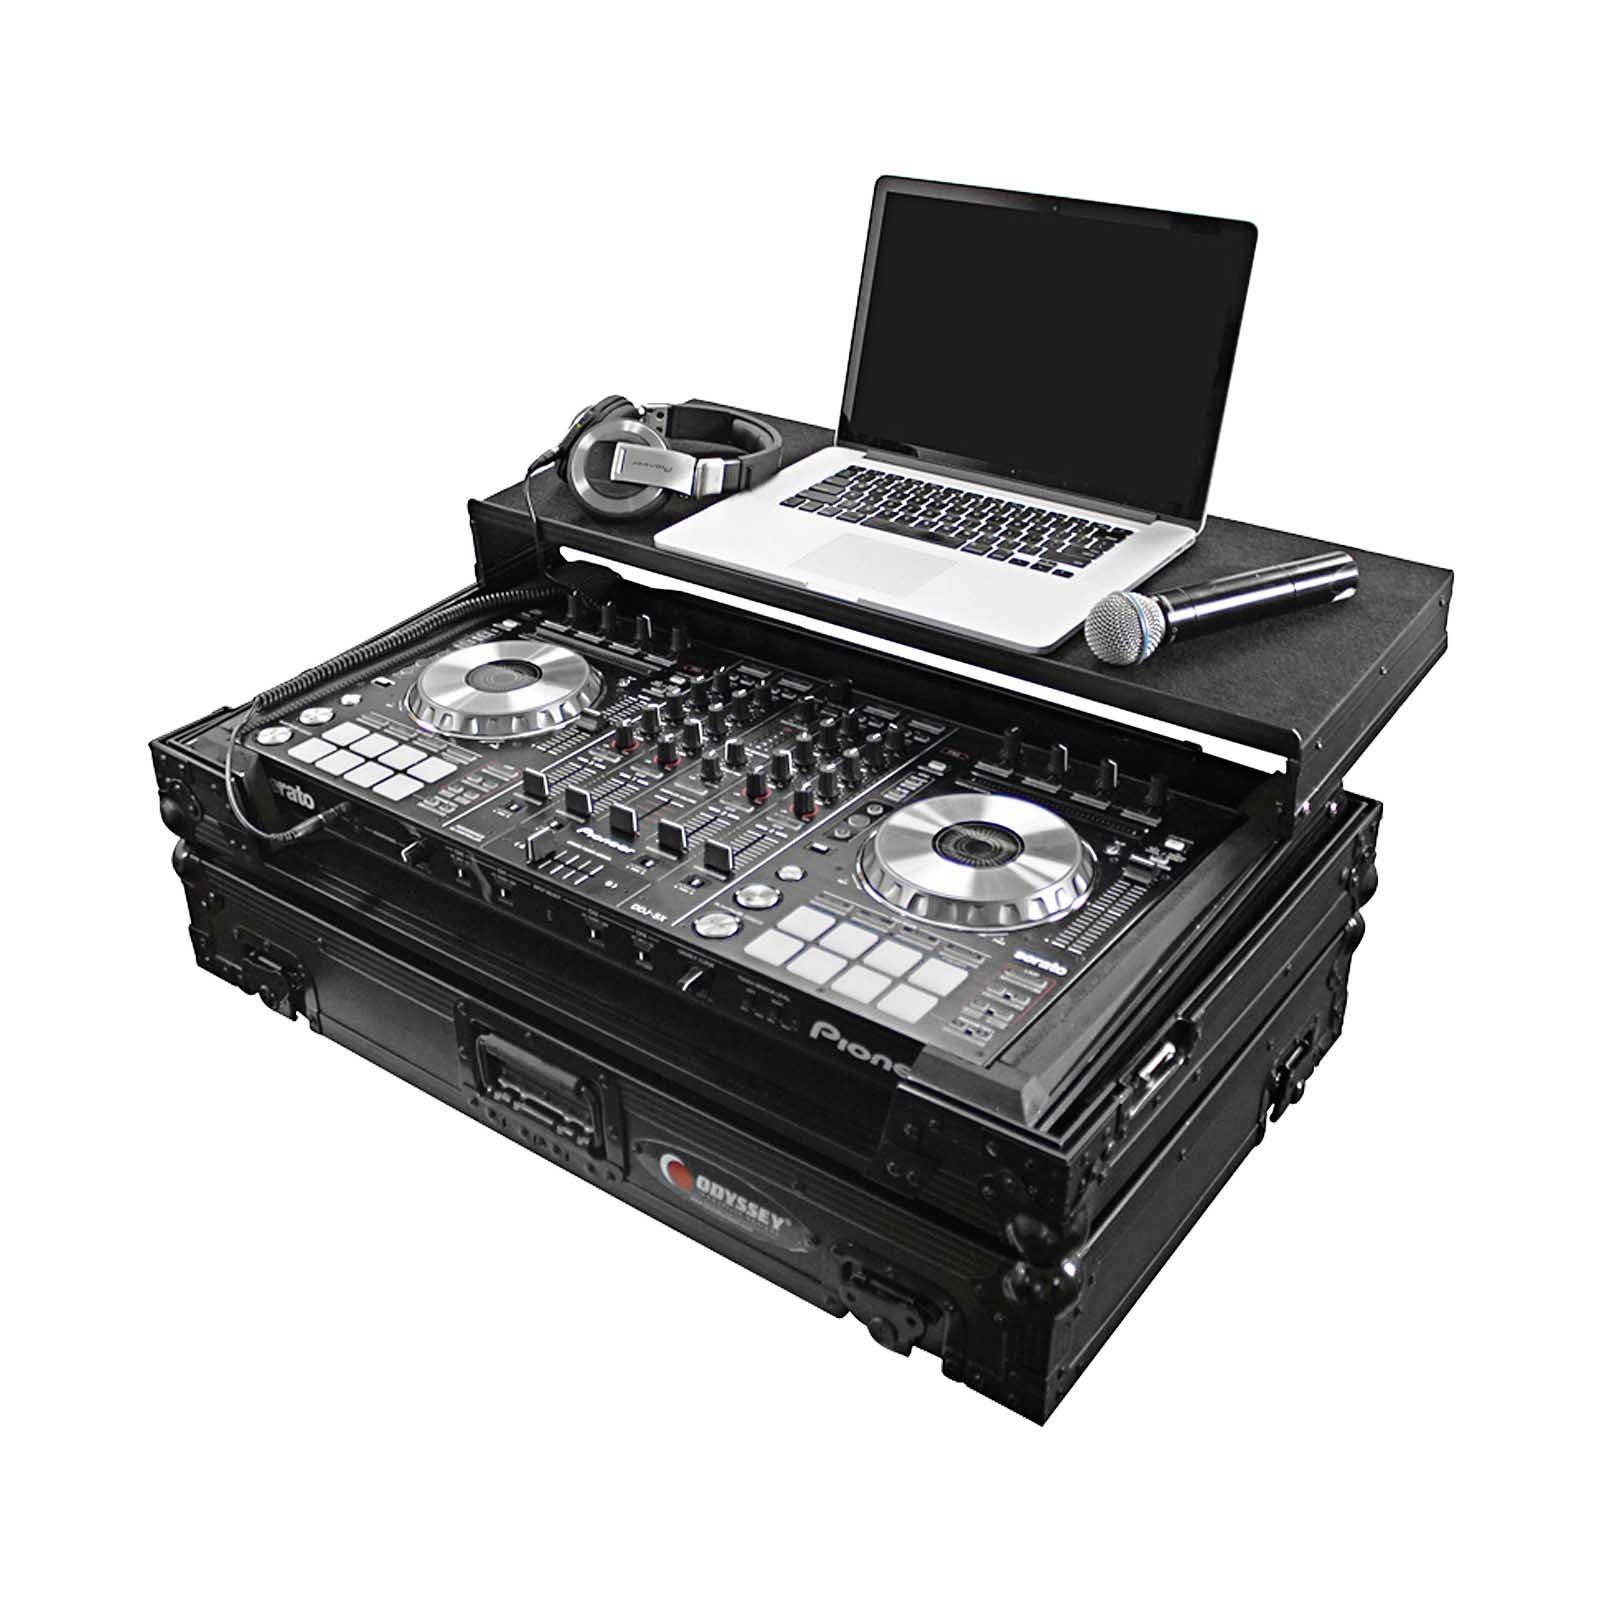 odyssey-fzgspiddjsxbl-black-label-pioneer-ddj-sx-ddj-sx2-case-customer-return-390.jpg